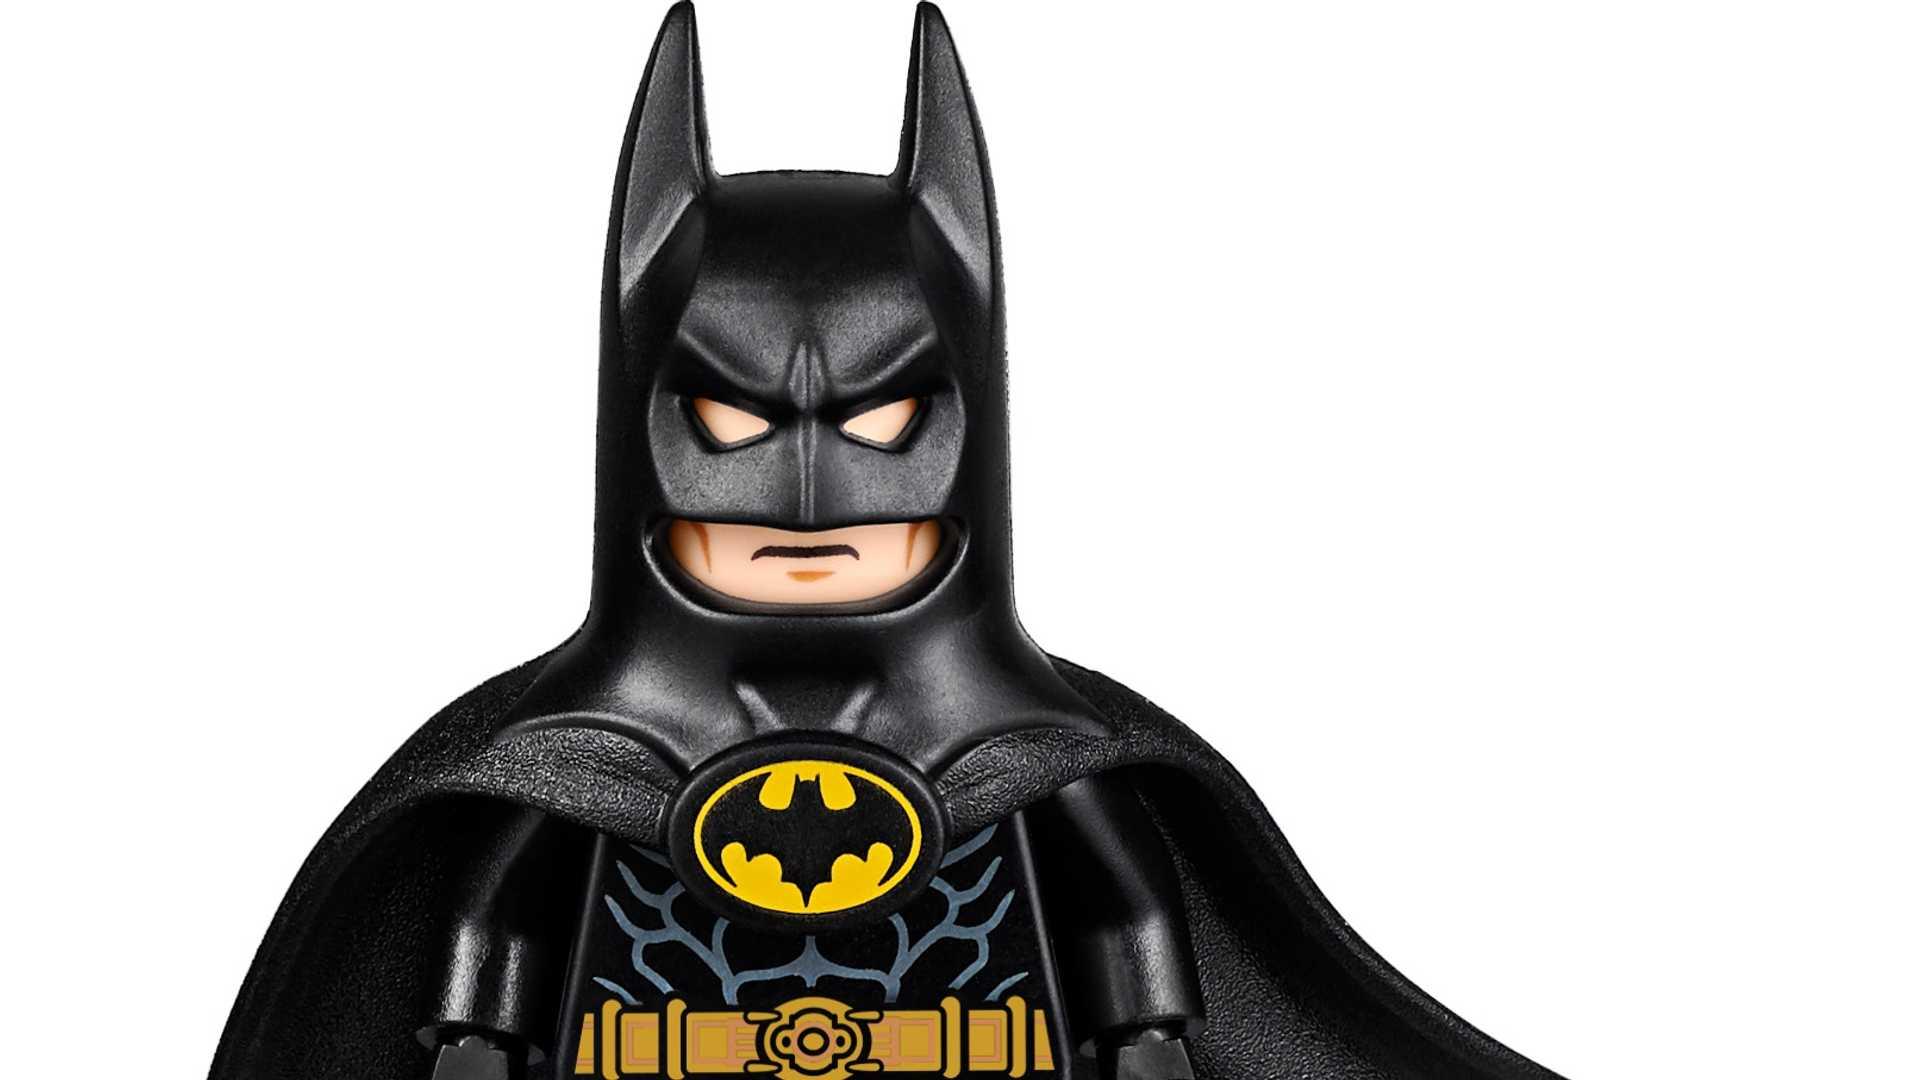 Lego-Batmobile-kit-1989-30